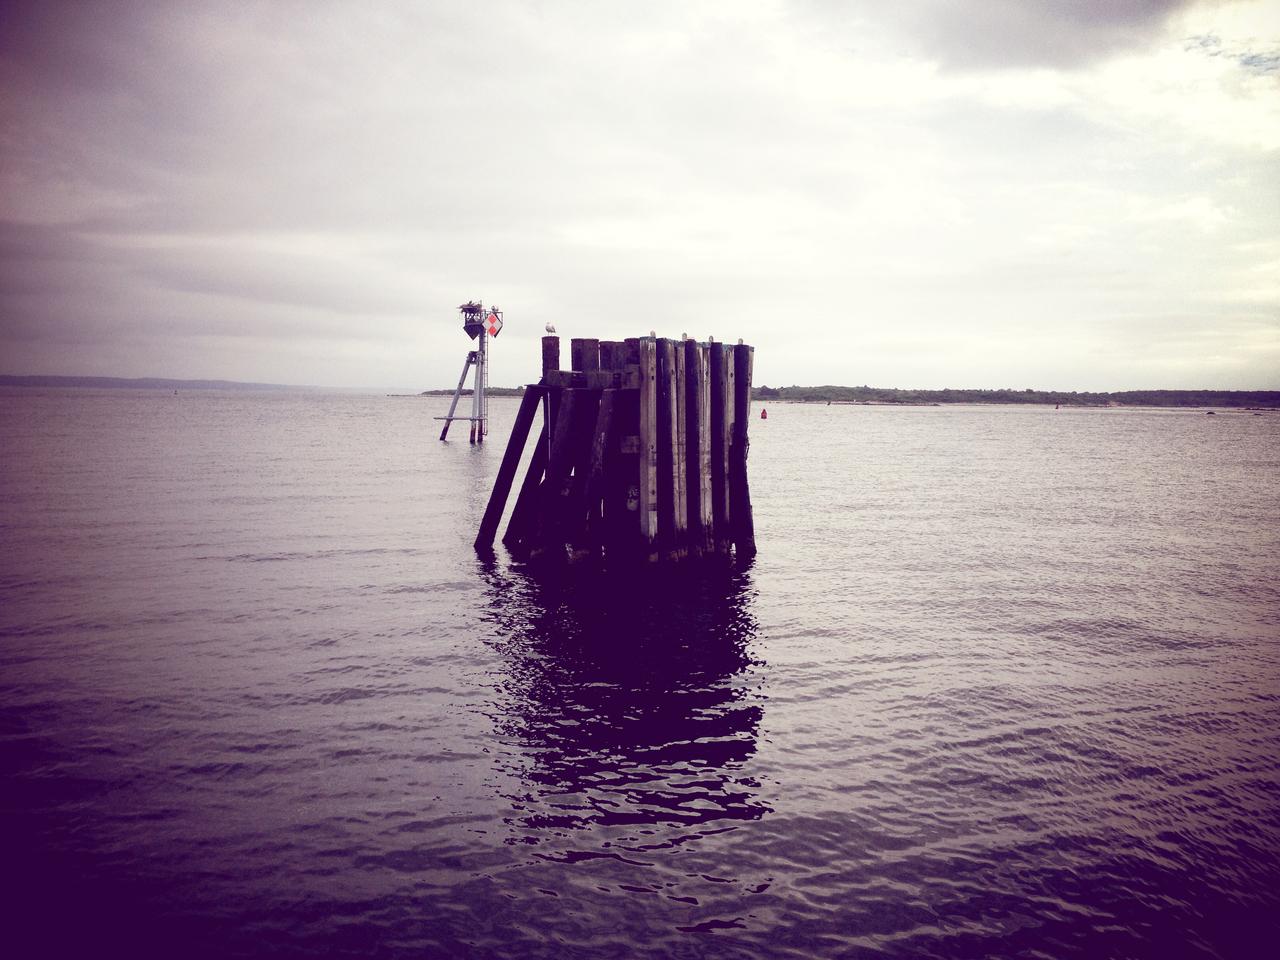 Dock Off #peppersearching #pepper #photos #water #sea #ocean #mv #boat